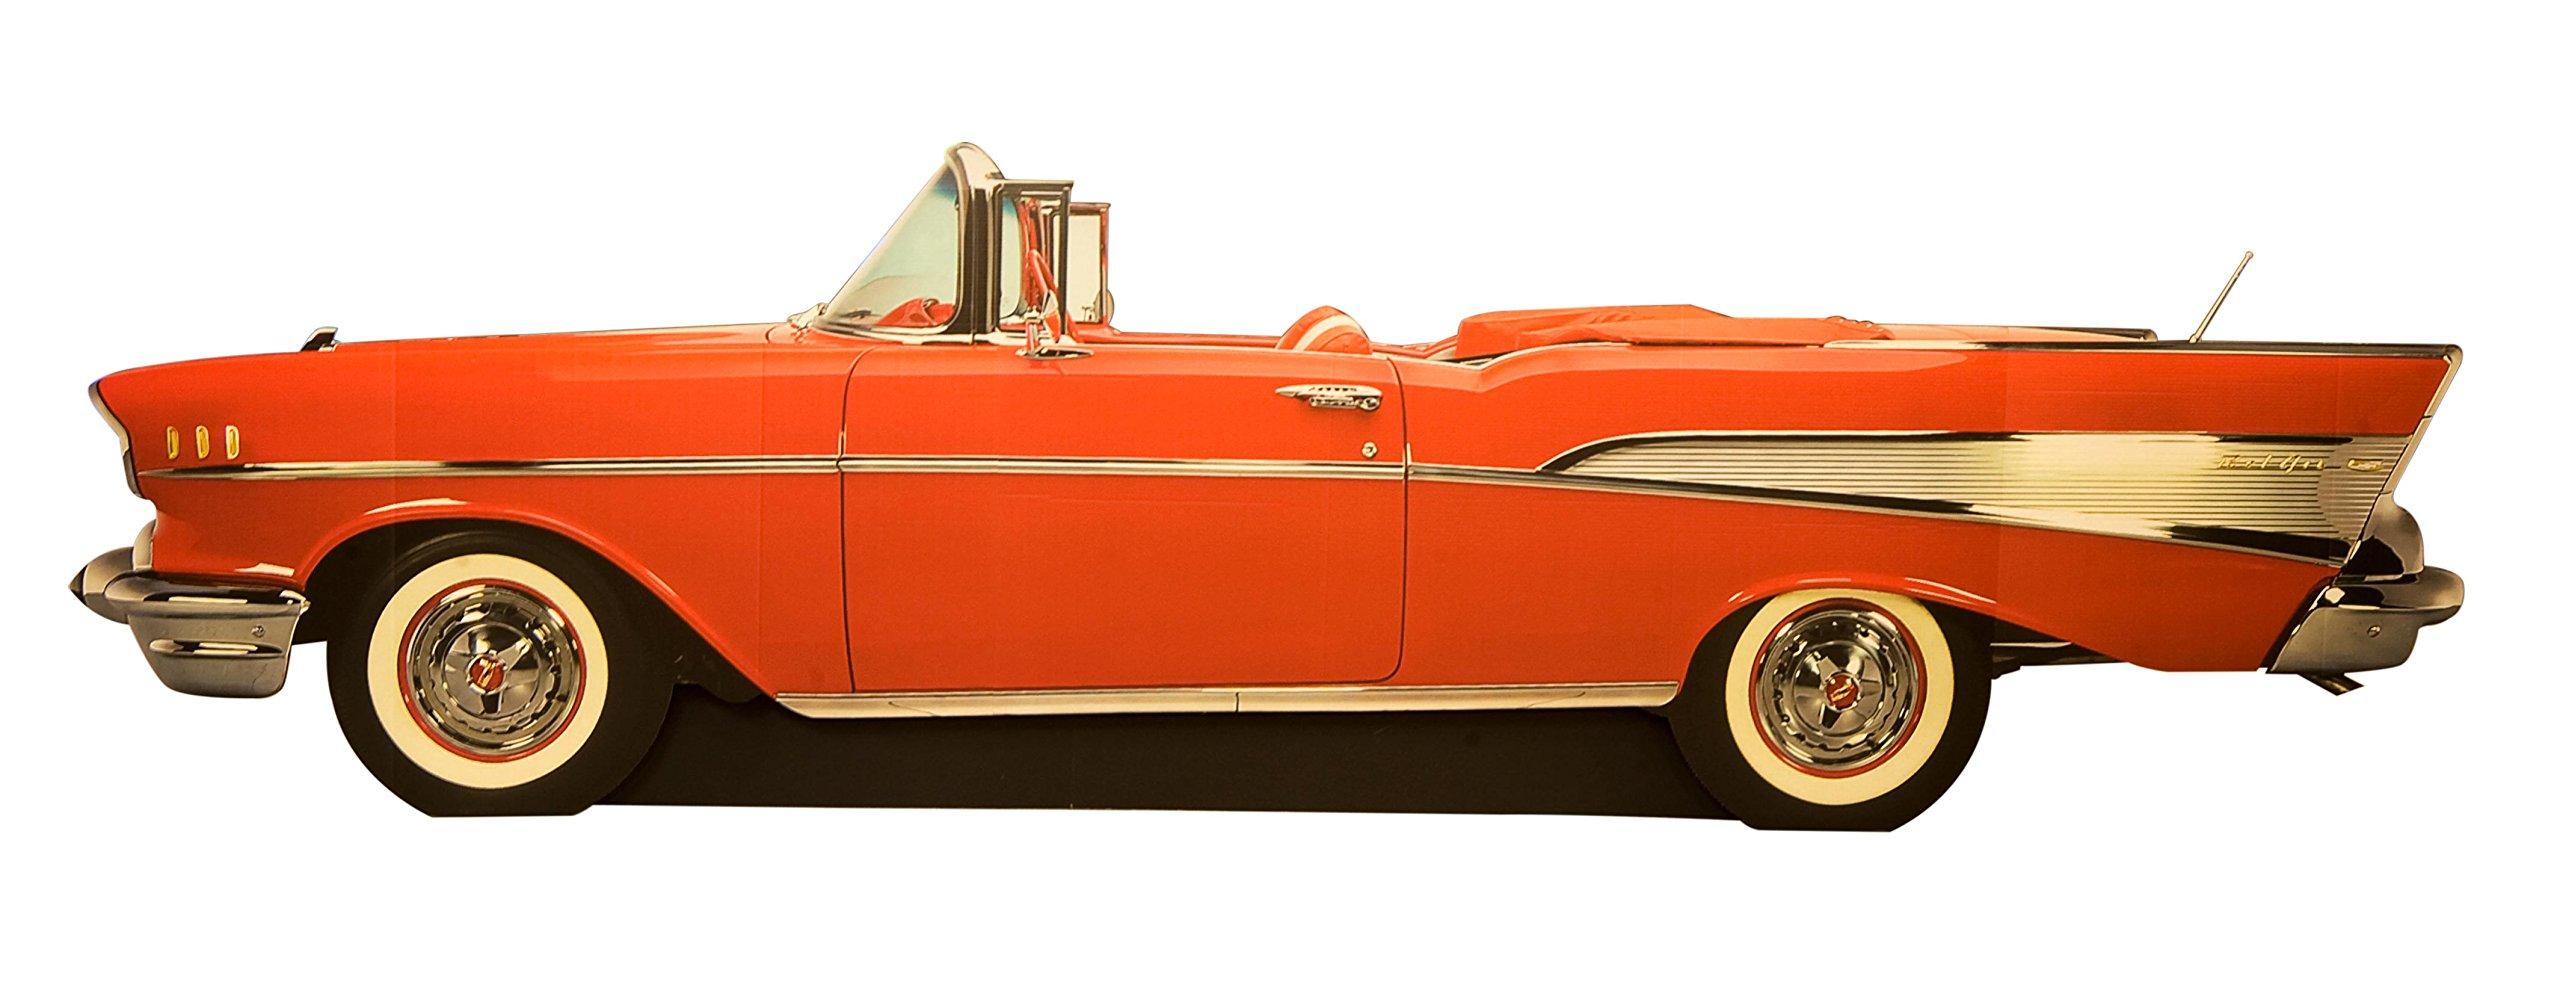 TCDesignerProducts Good Times Bel Air Car Kit Cardboard Cutout - 4' high, 13' 6'' wide, and 9'' deep